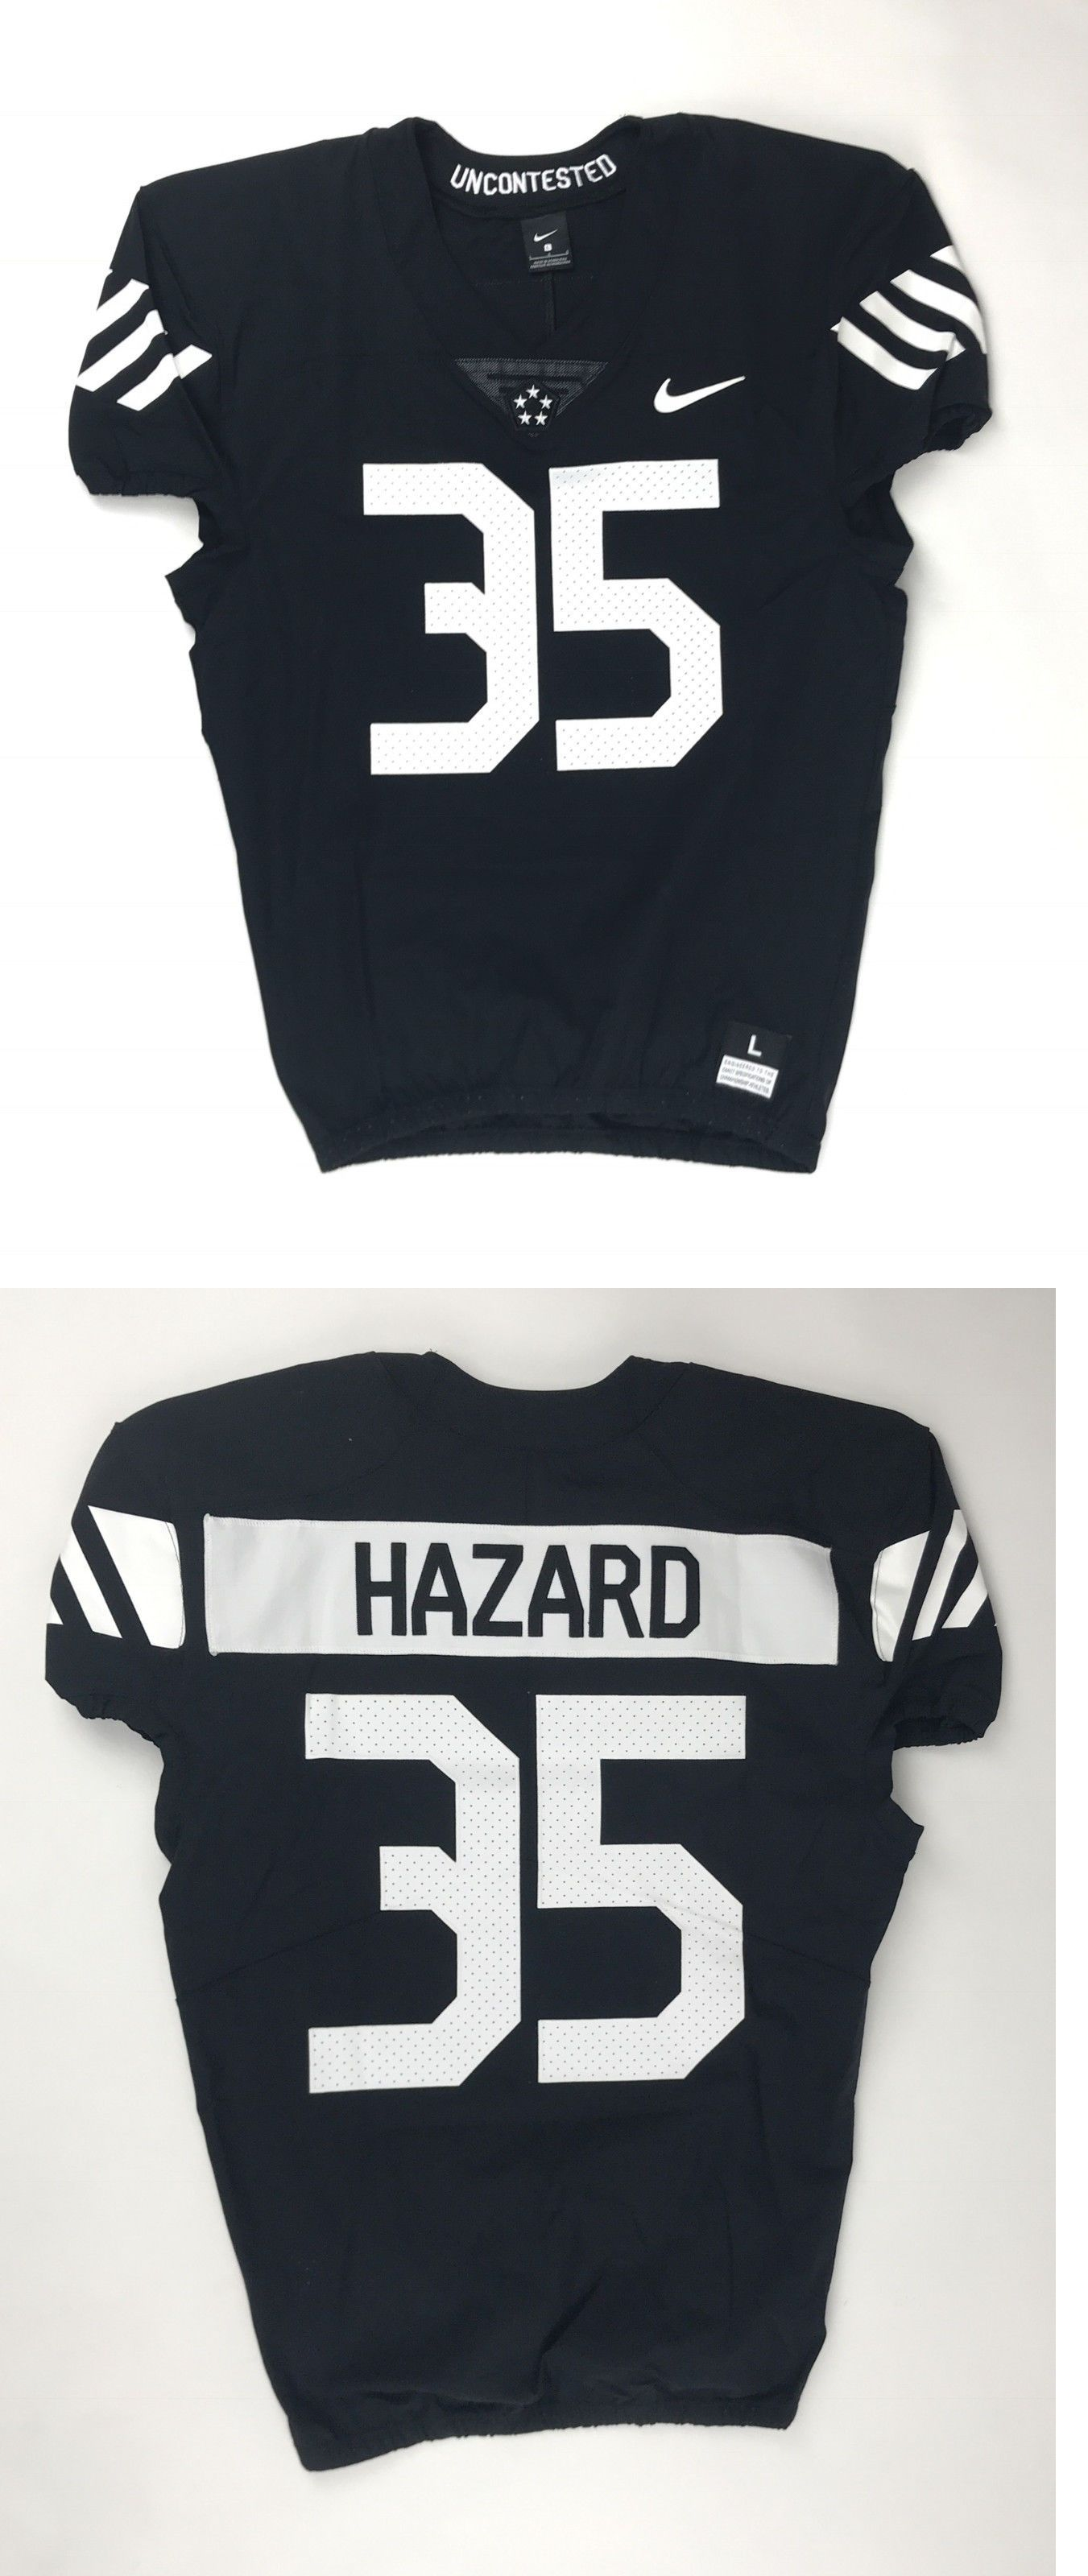 36c73cc57 Clothing 21218  New Nike Vapor Pro Hazard  35 Football Jersey Men S Large  Black 908635 -  BUY IT NOW ONLY   34.99 on  eBay  clothing  vapor  hazard  ...